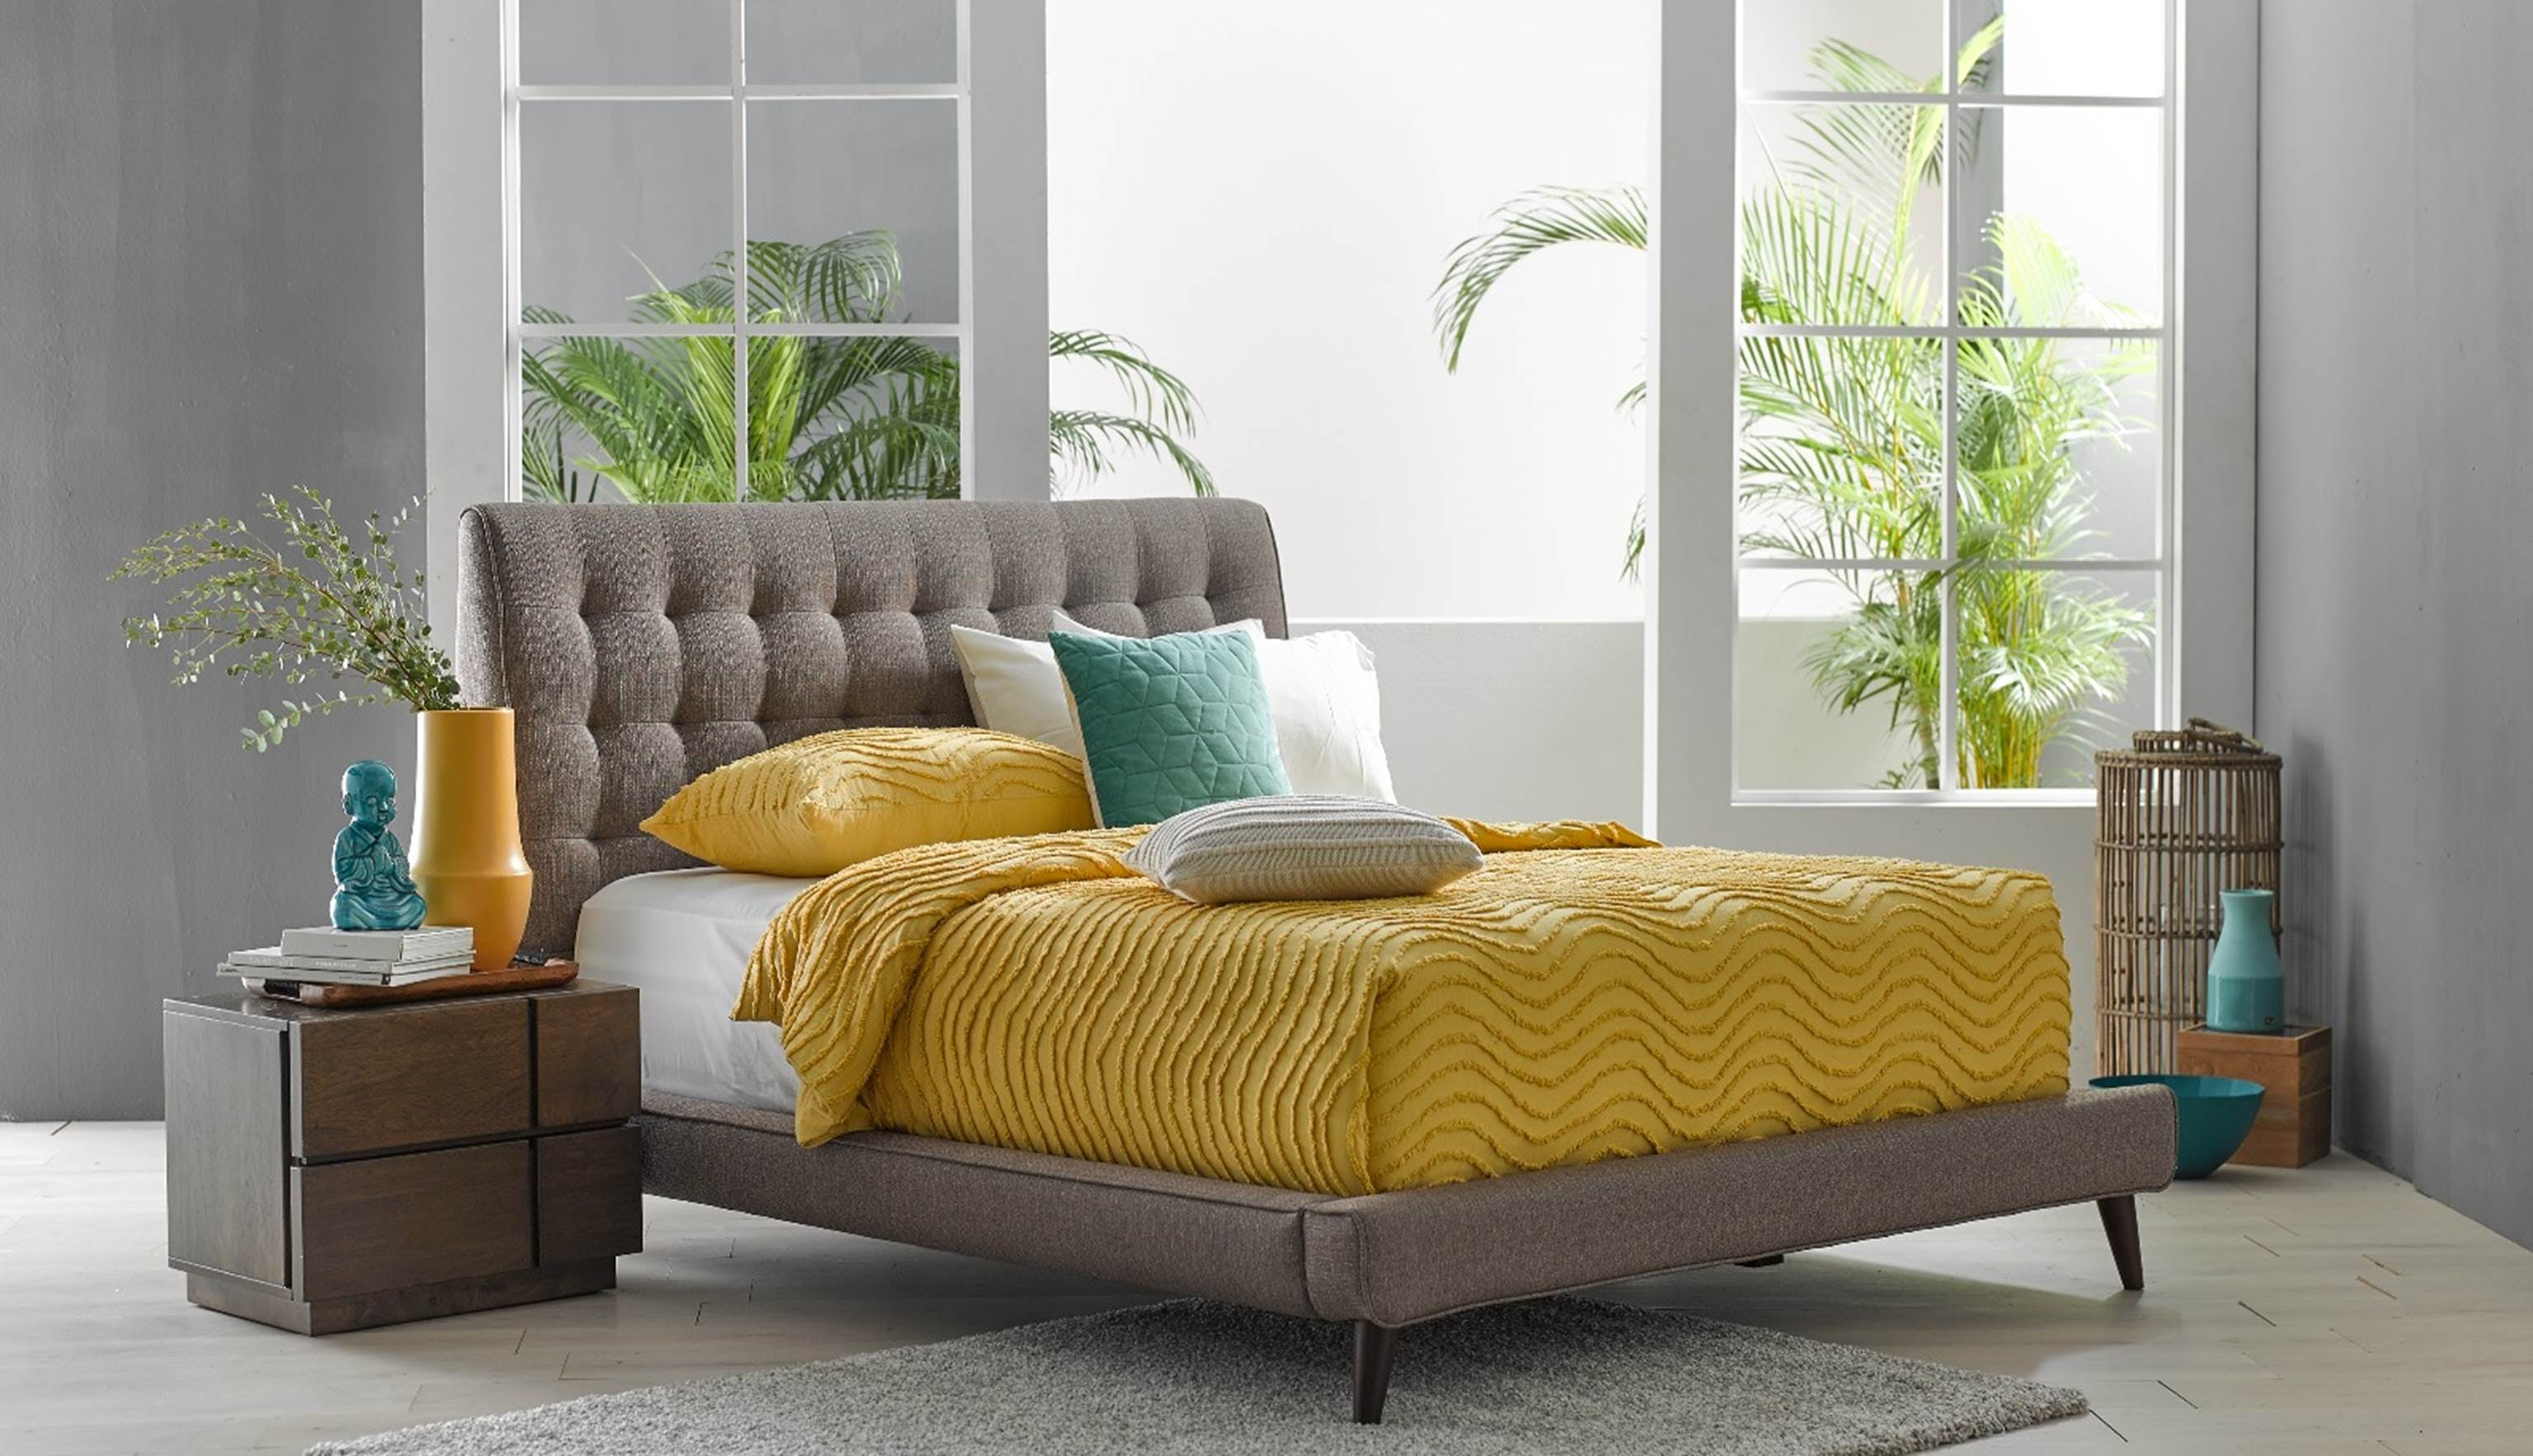 6f75806edd9e6 De Fabio Queen Size Bed Frame in Fabric Upholstery